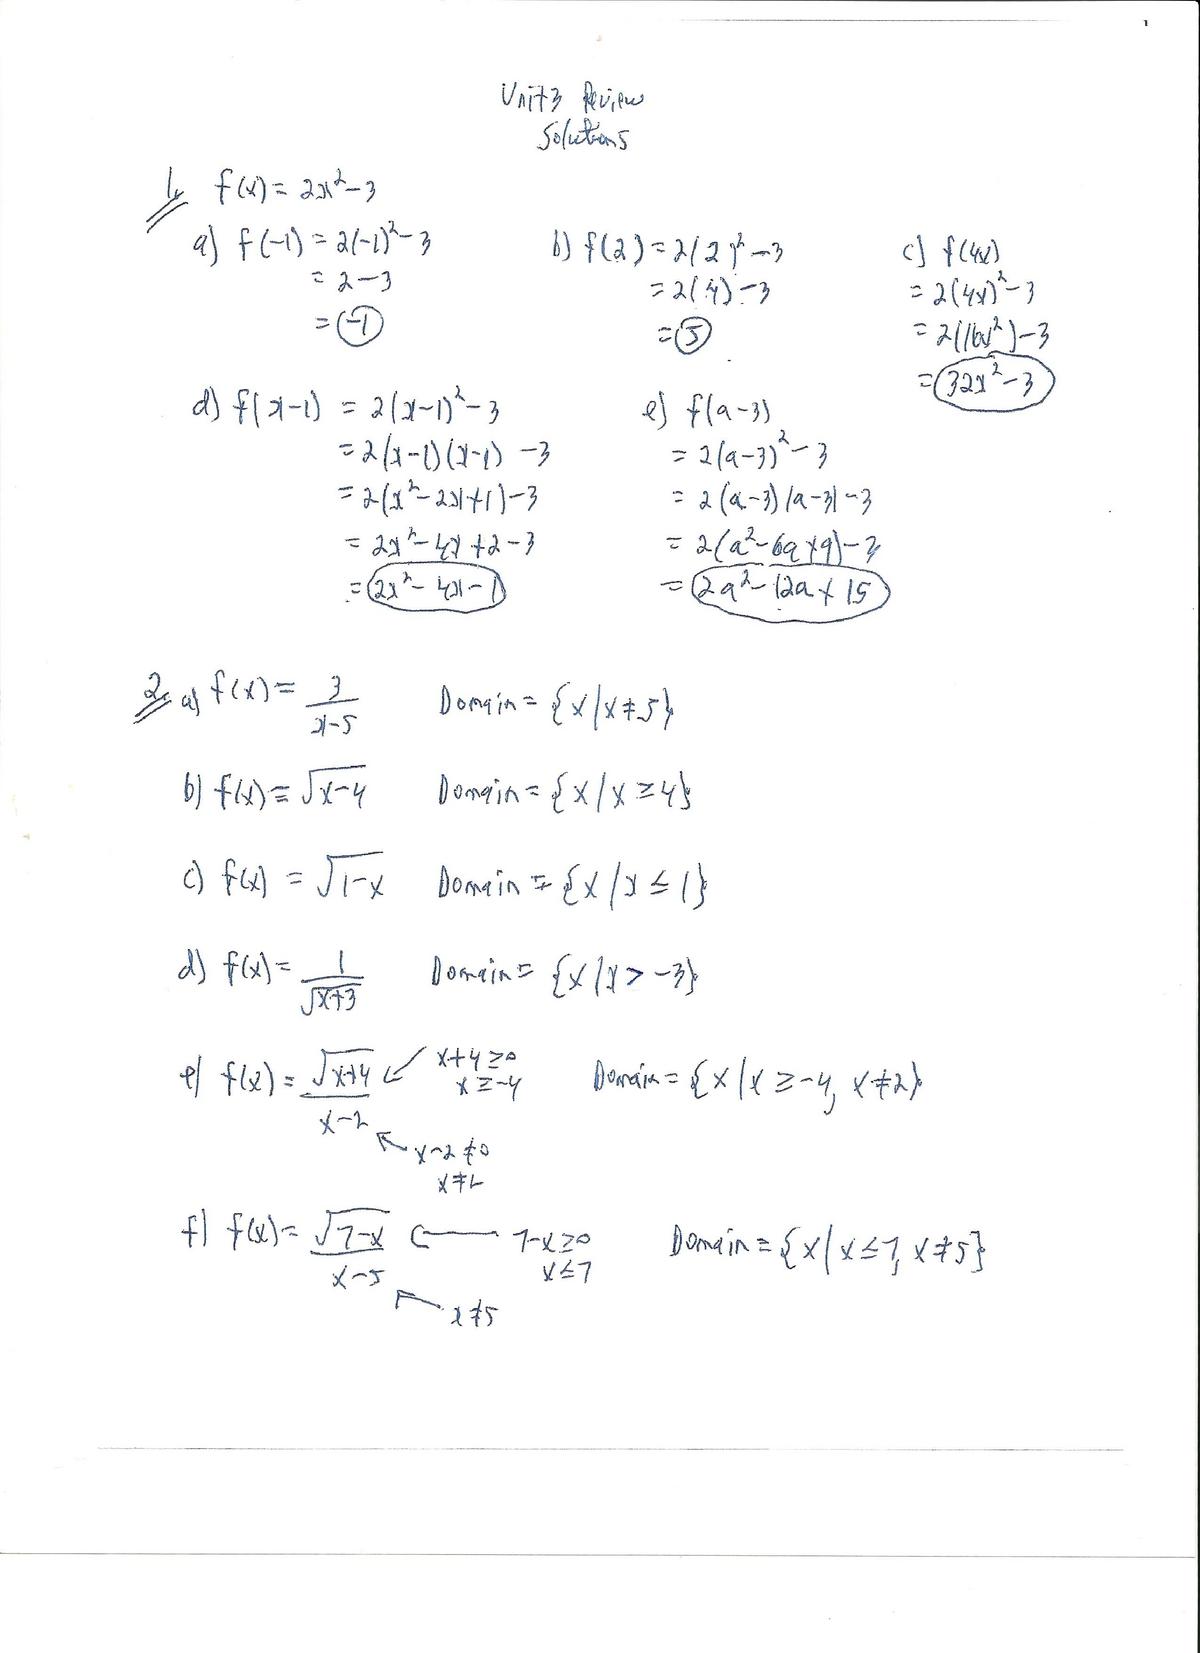 Unit 3 Functions - Answers - MA1101: Math 1101 - StuDocu